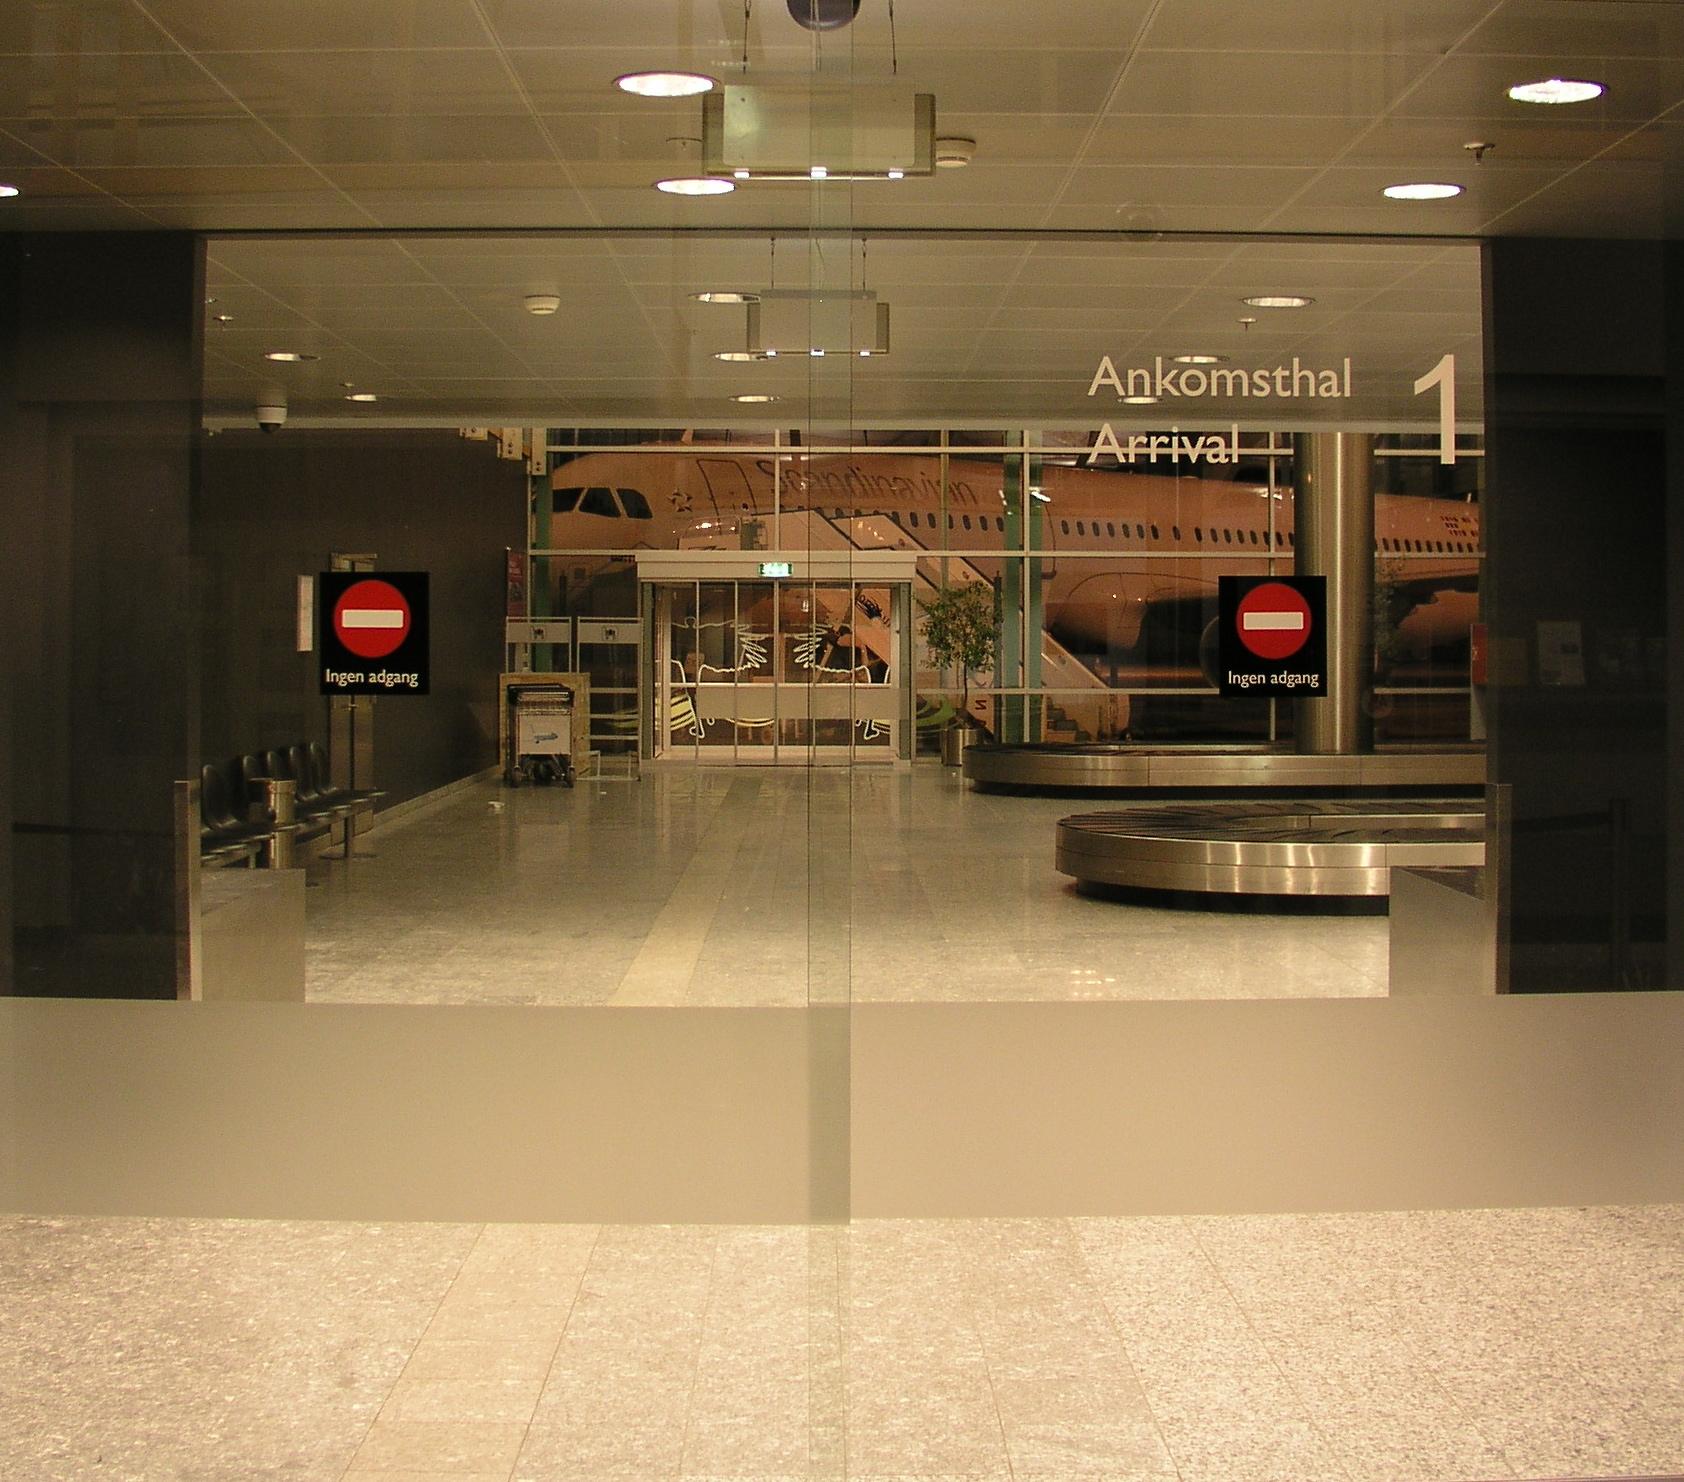 ankomst aalborg lufthavn